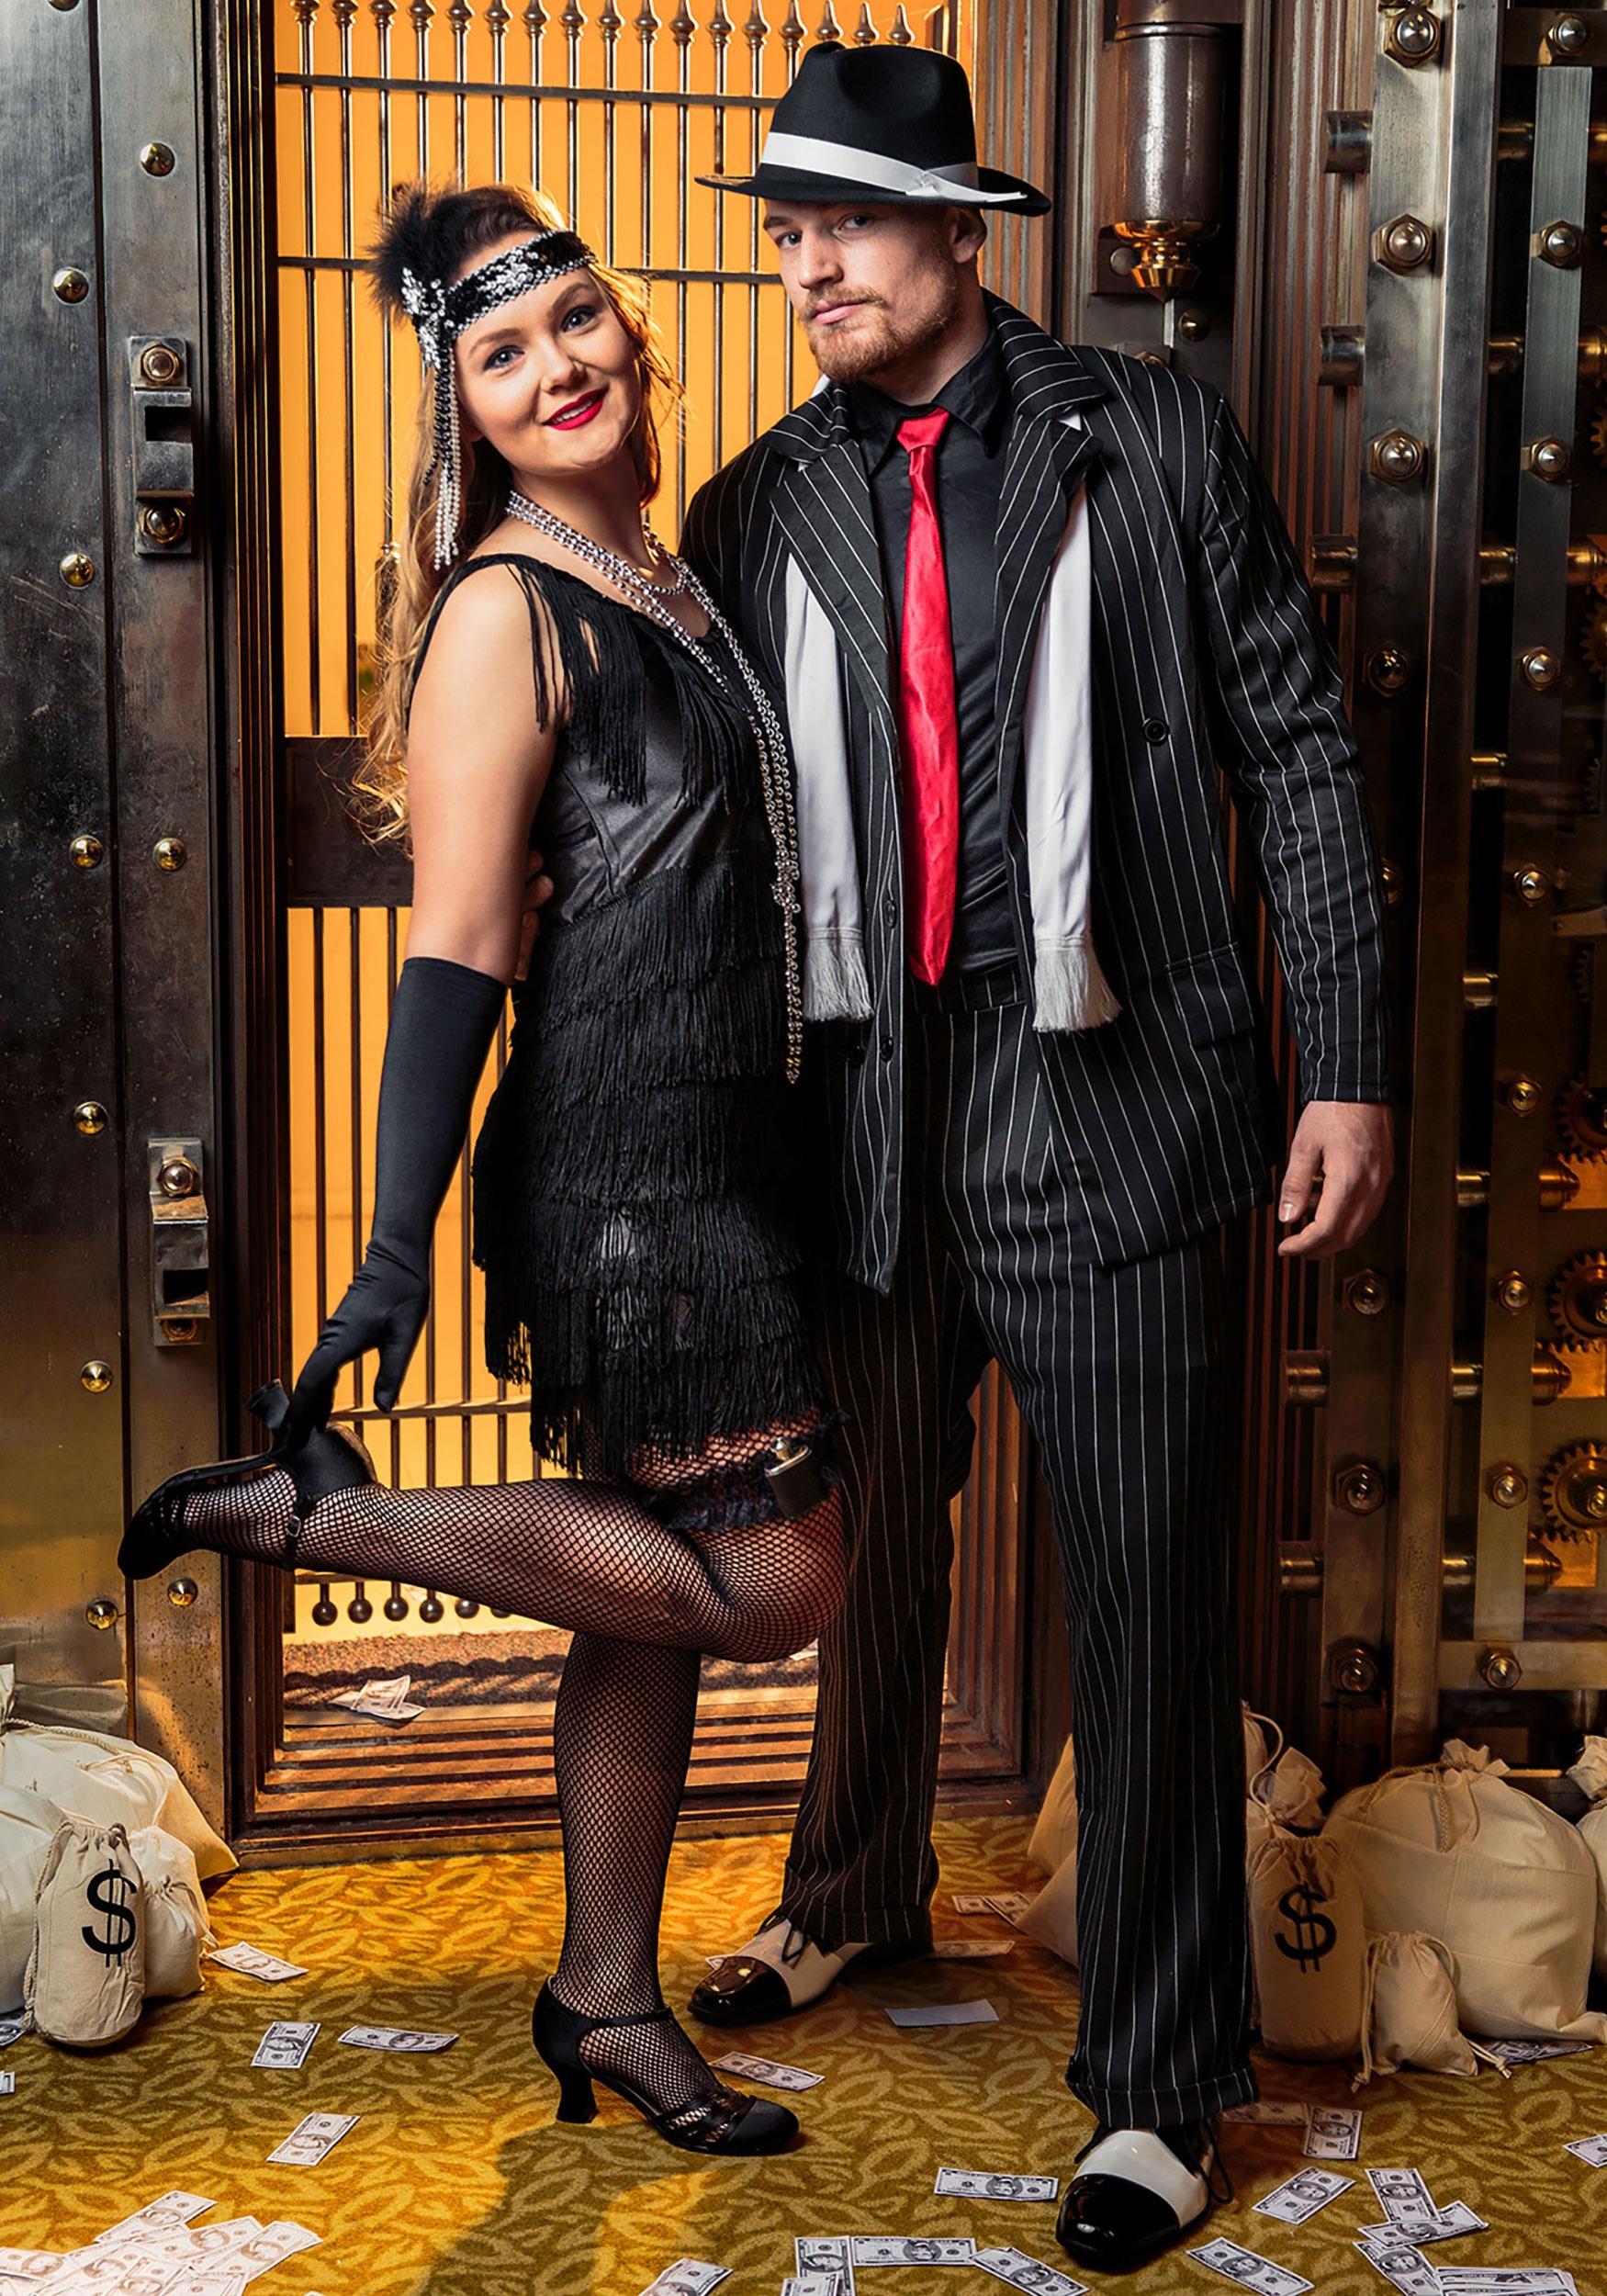 Plus Size 1920s Flapper Costume - Womens Vintage Fringe Flapper Dress